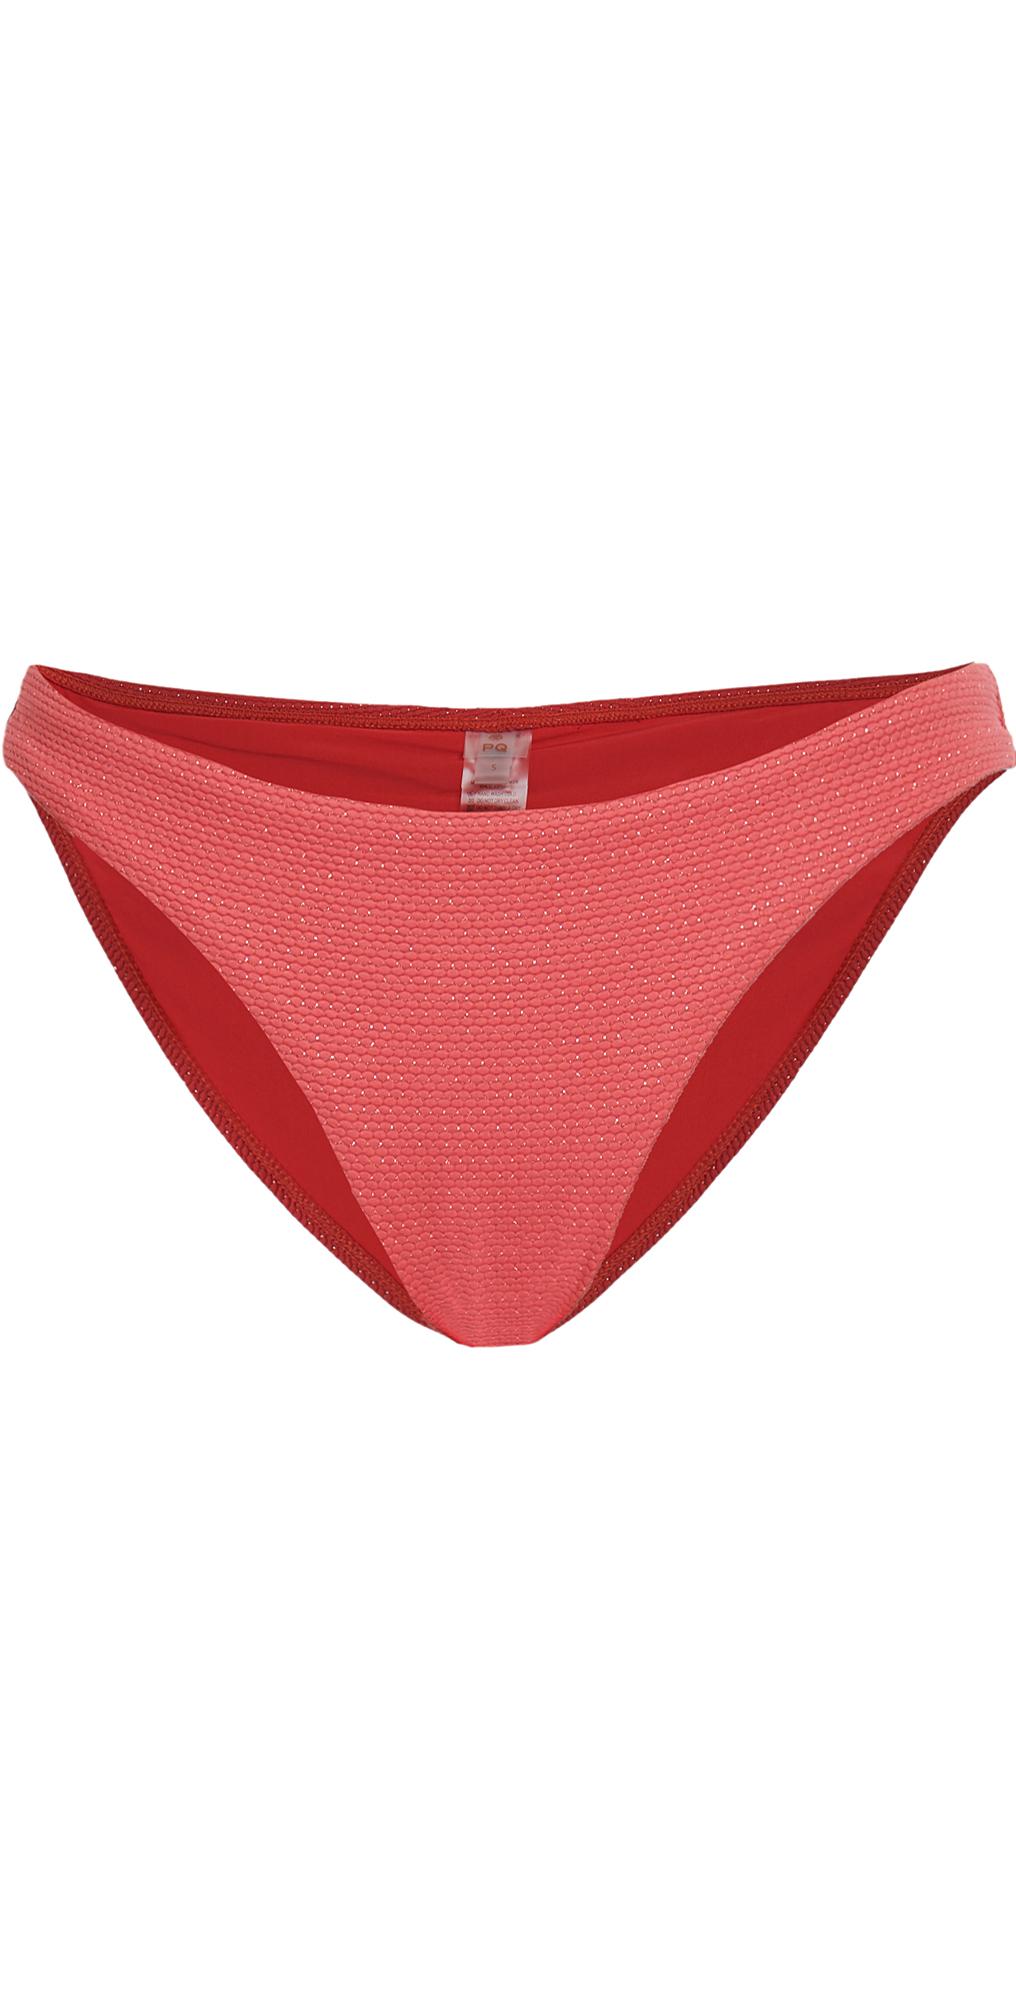 PQ Swim Basic Full Bikini Bottoms